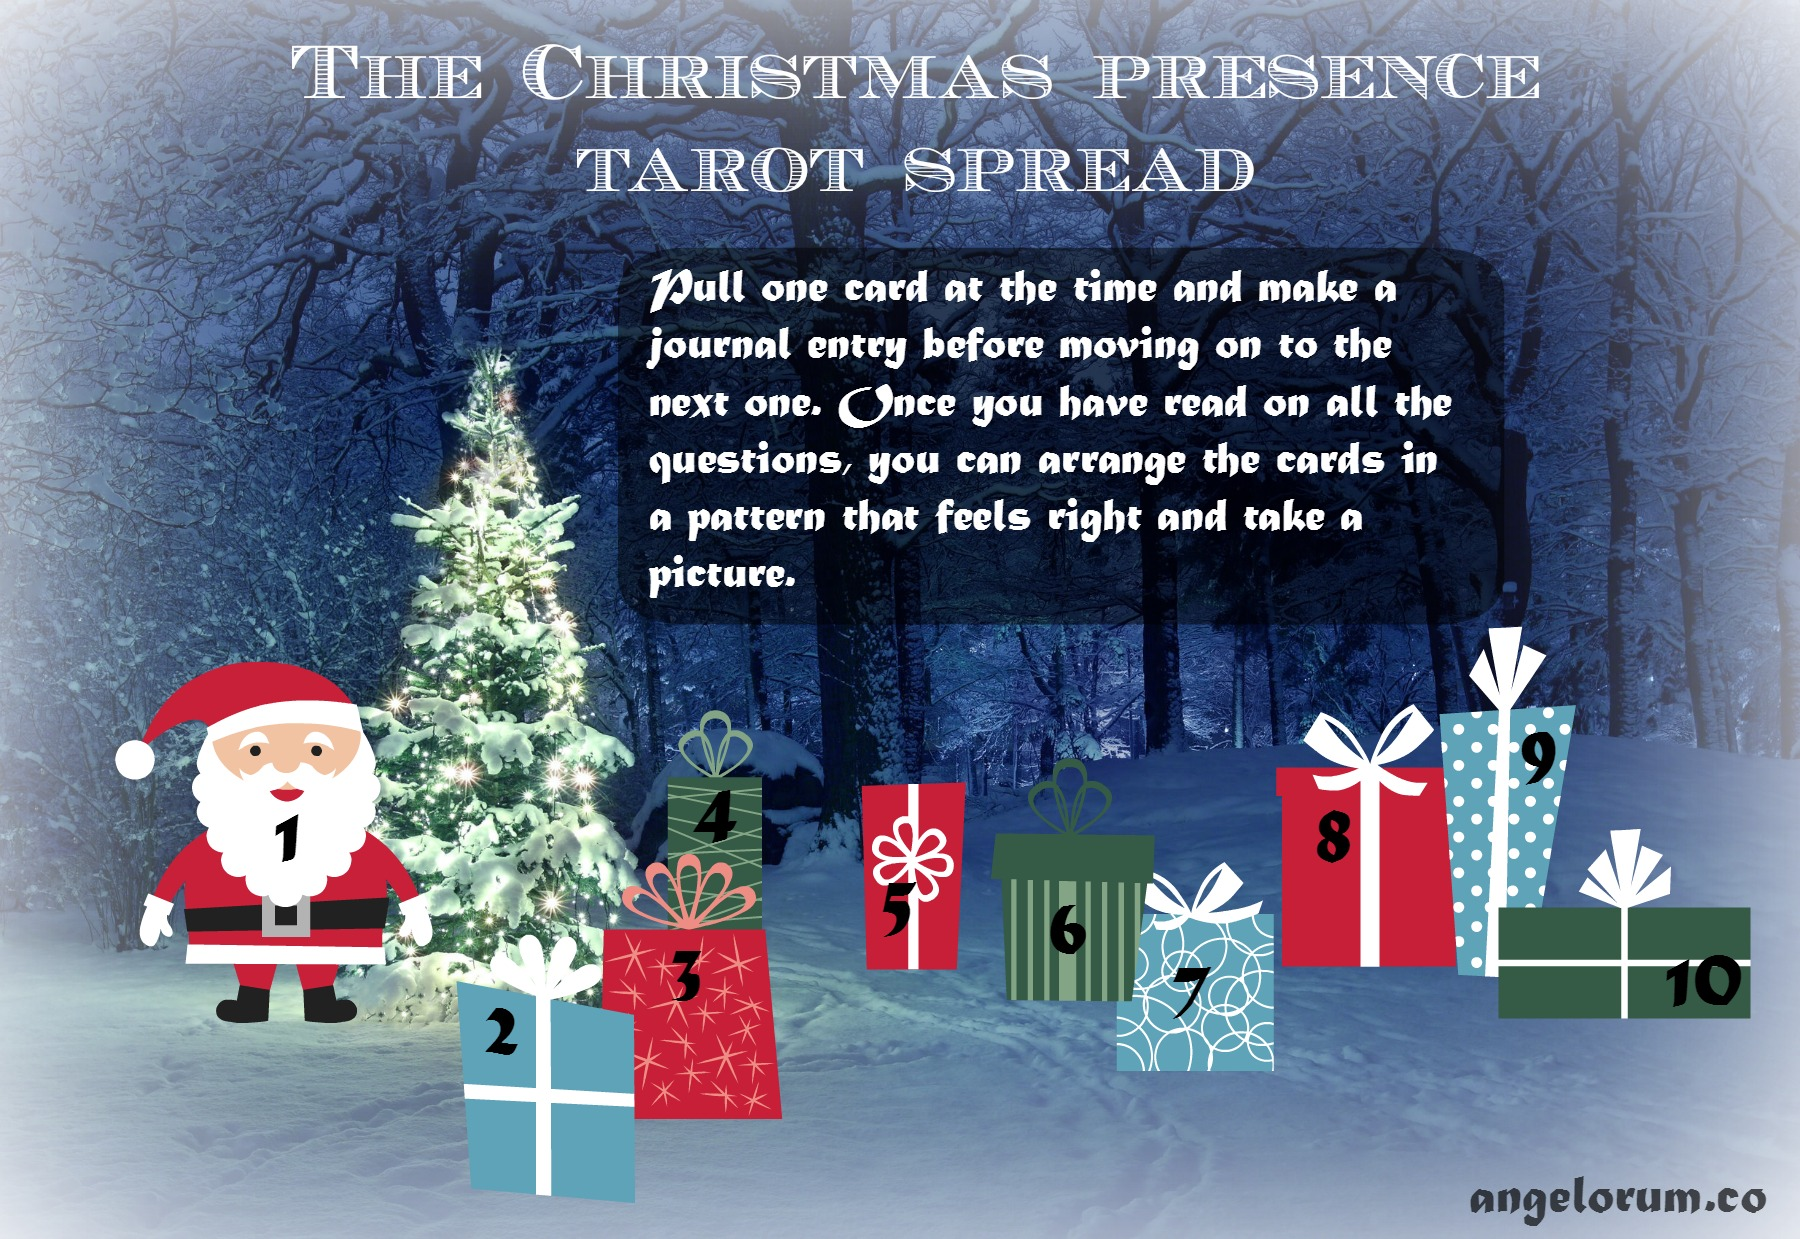 The Christmas Presence Tarot Spread